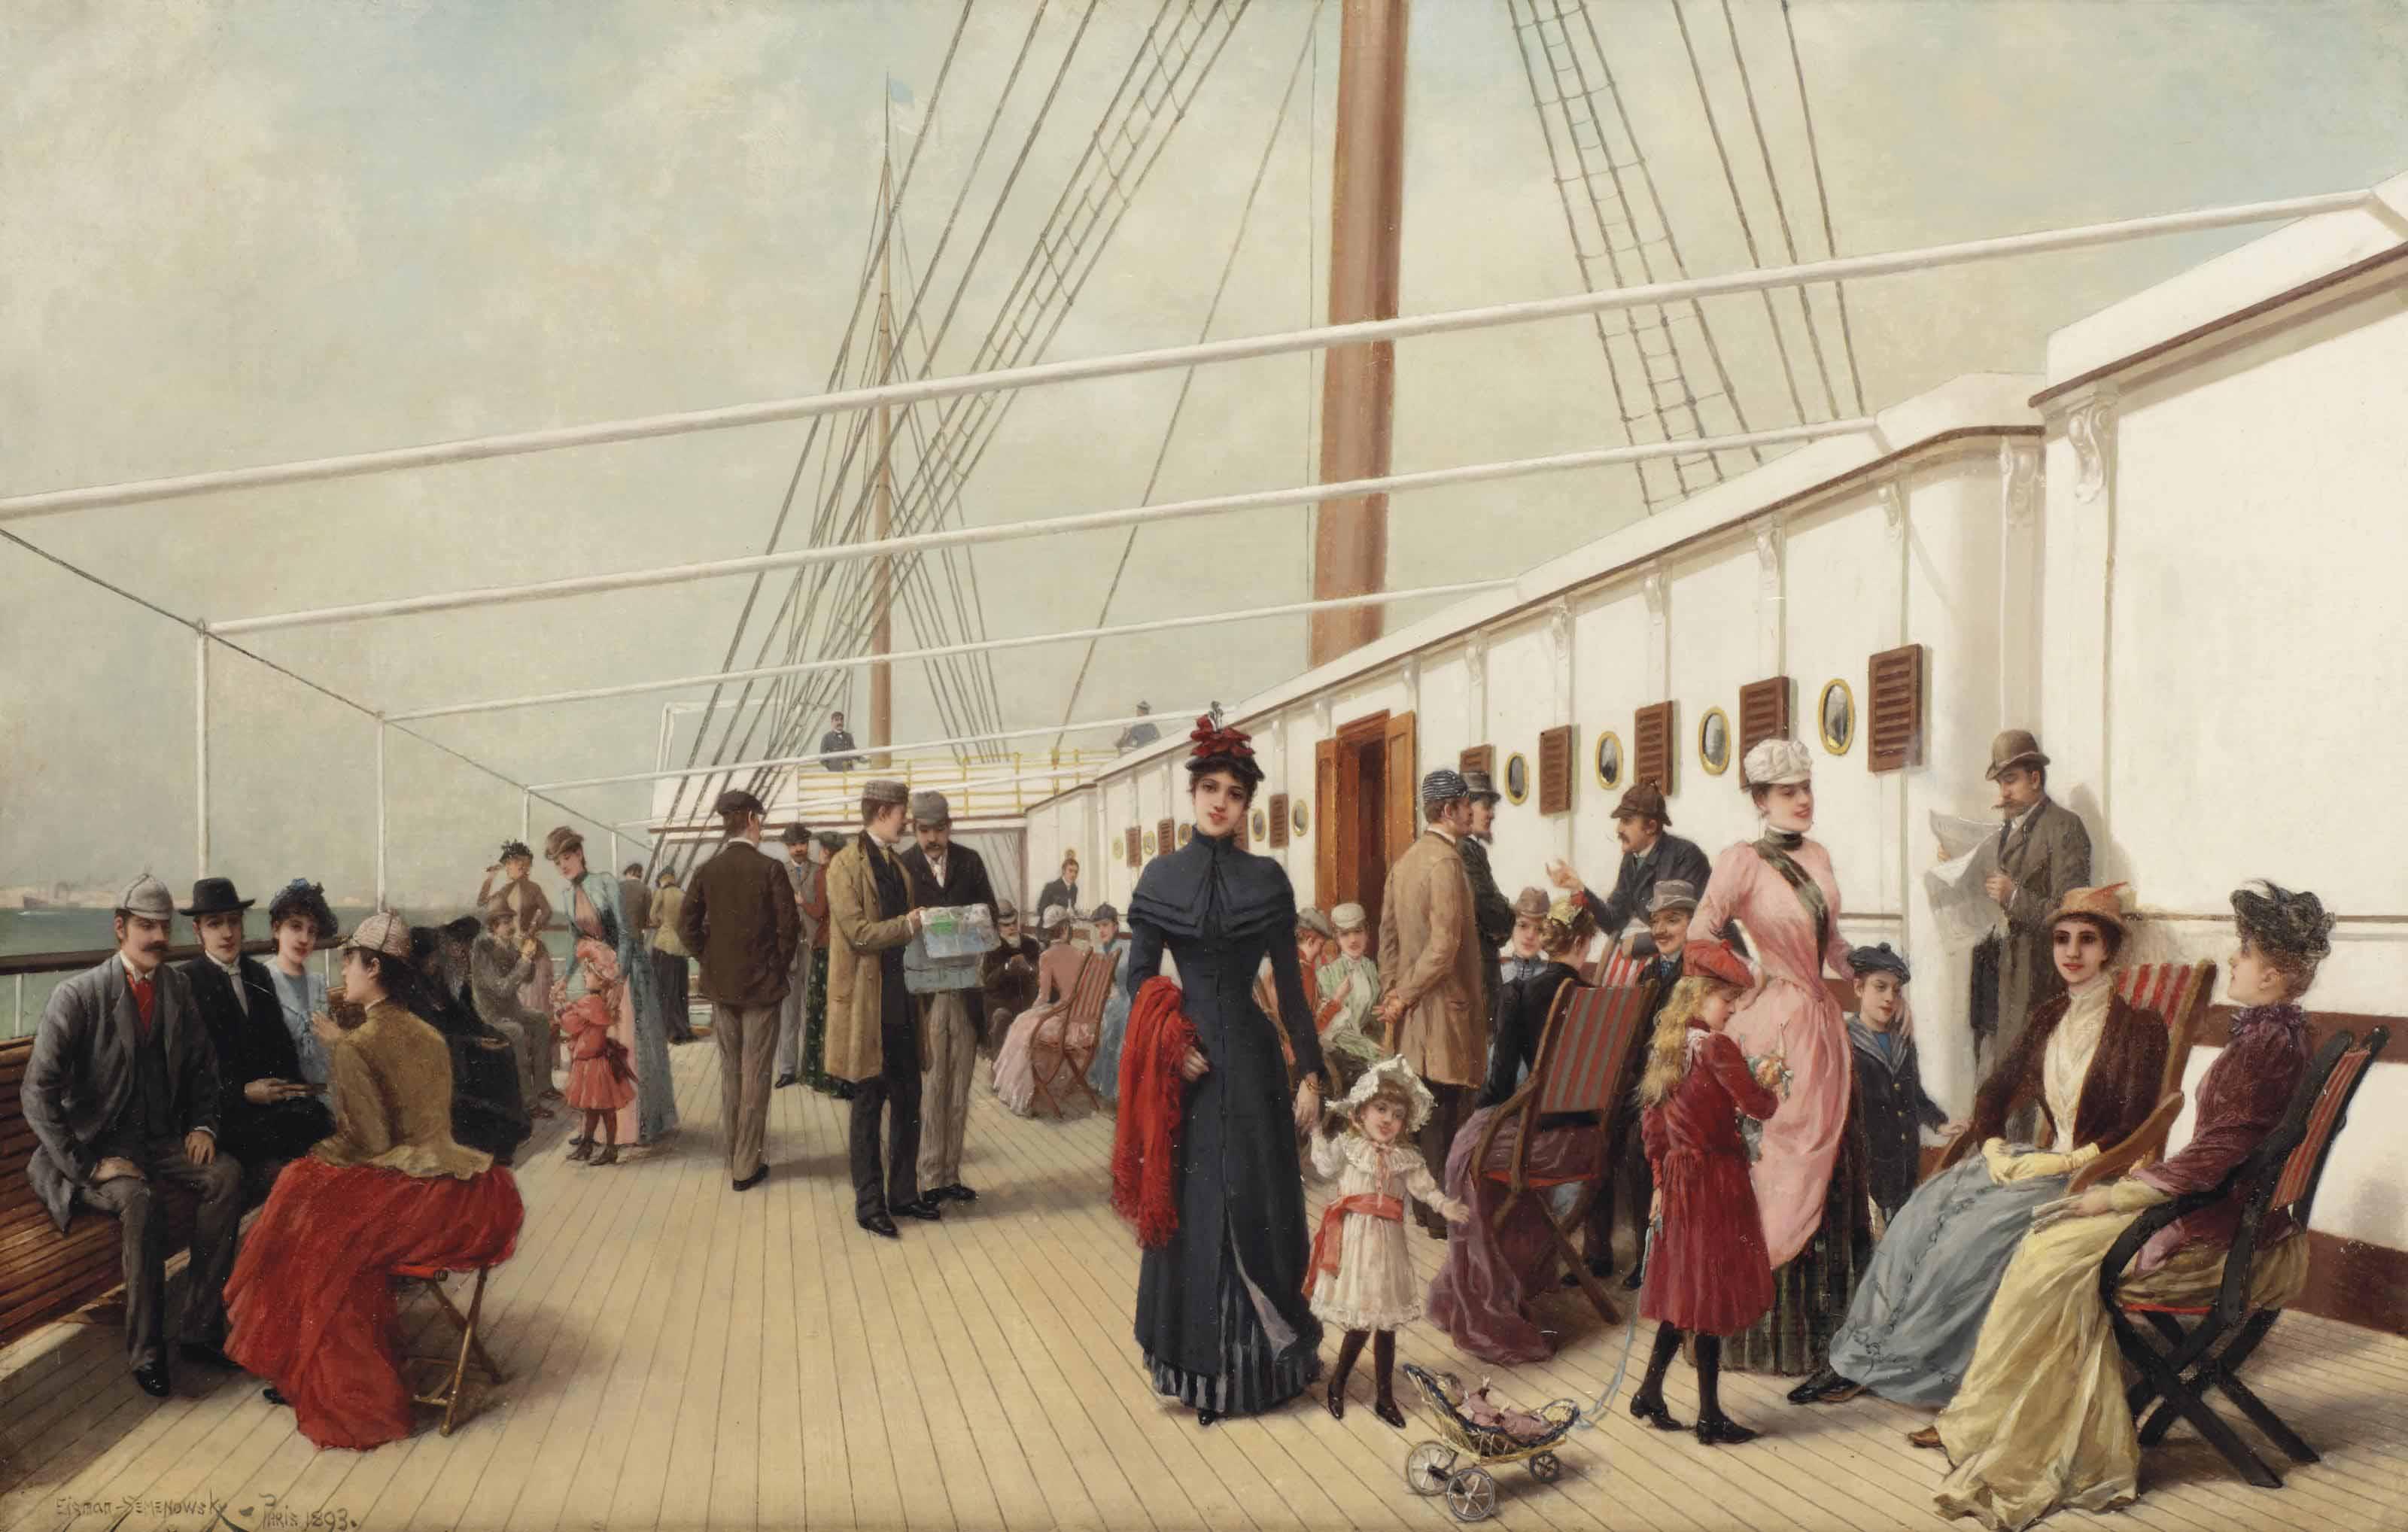 Elegant figures strolling on the upper deck of an ocean steamer